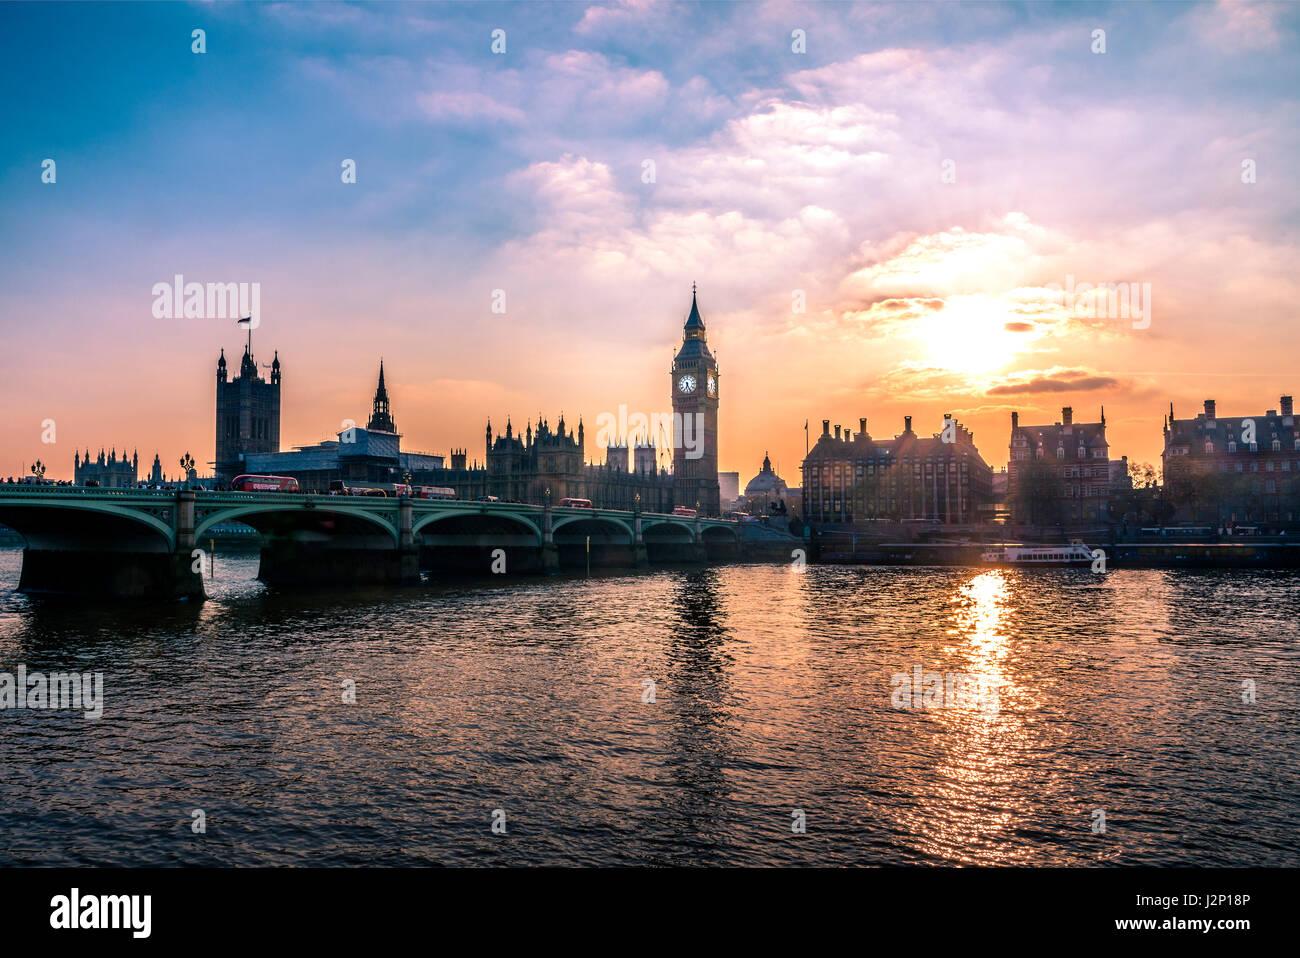 Big Ben, Houses of Parliament, Westminster Bridge, Thames, Coucher de soleil, City of Westminster, London, Londres, Photo Stock